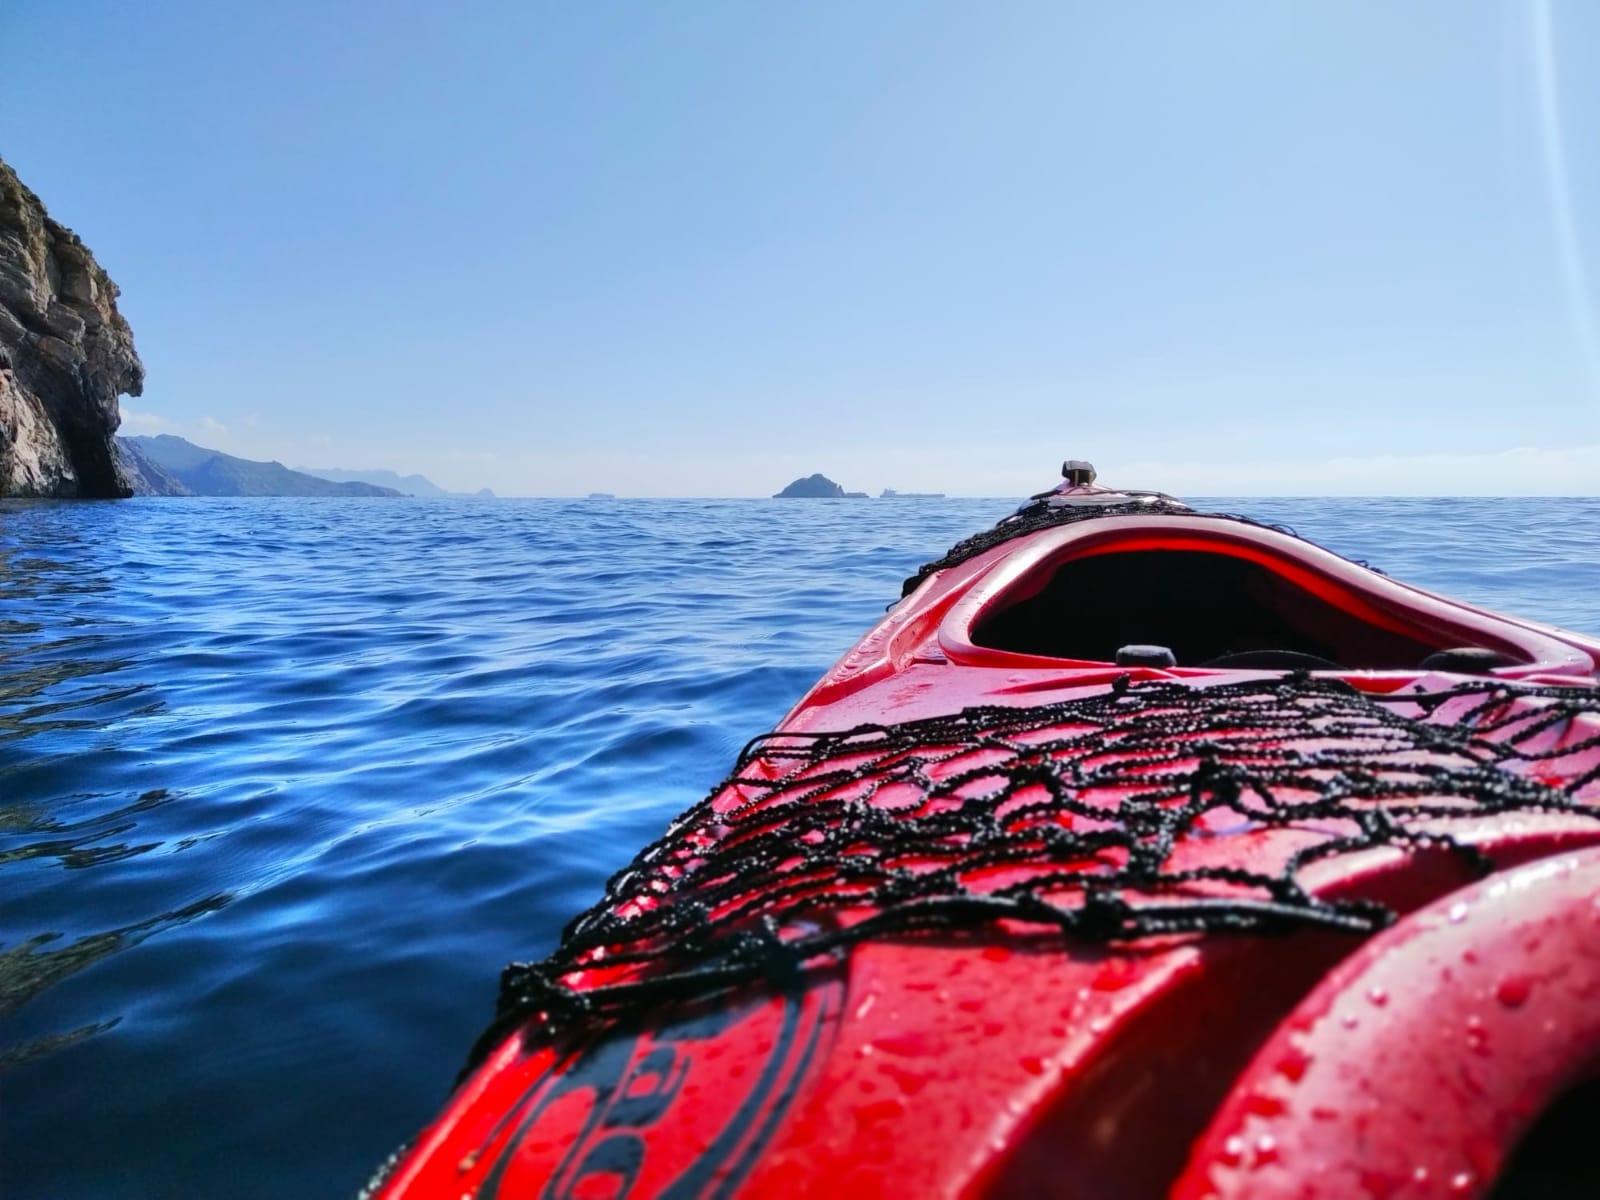 isla kayak paloma